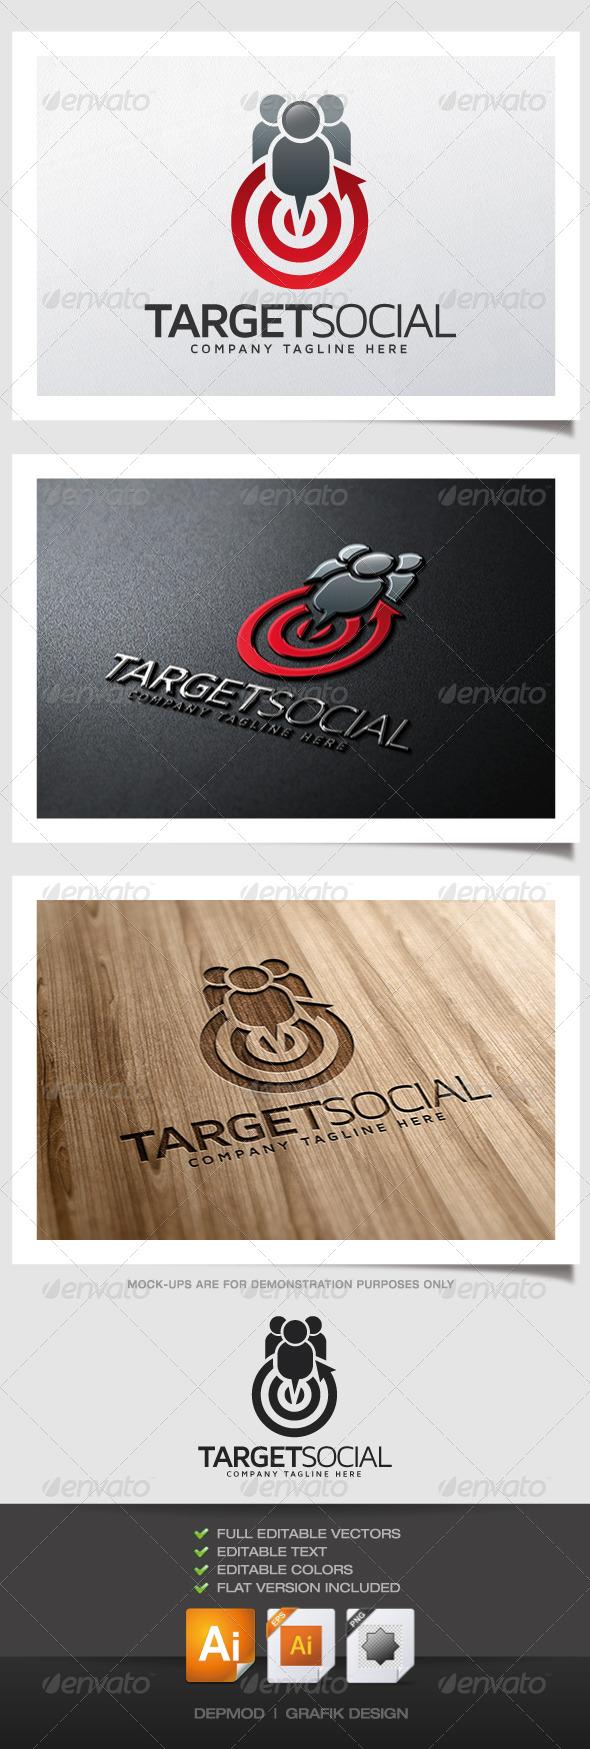 GraphicRiver Target Social Logo 5188856